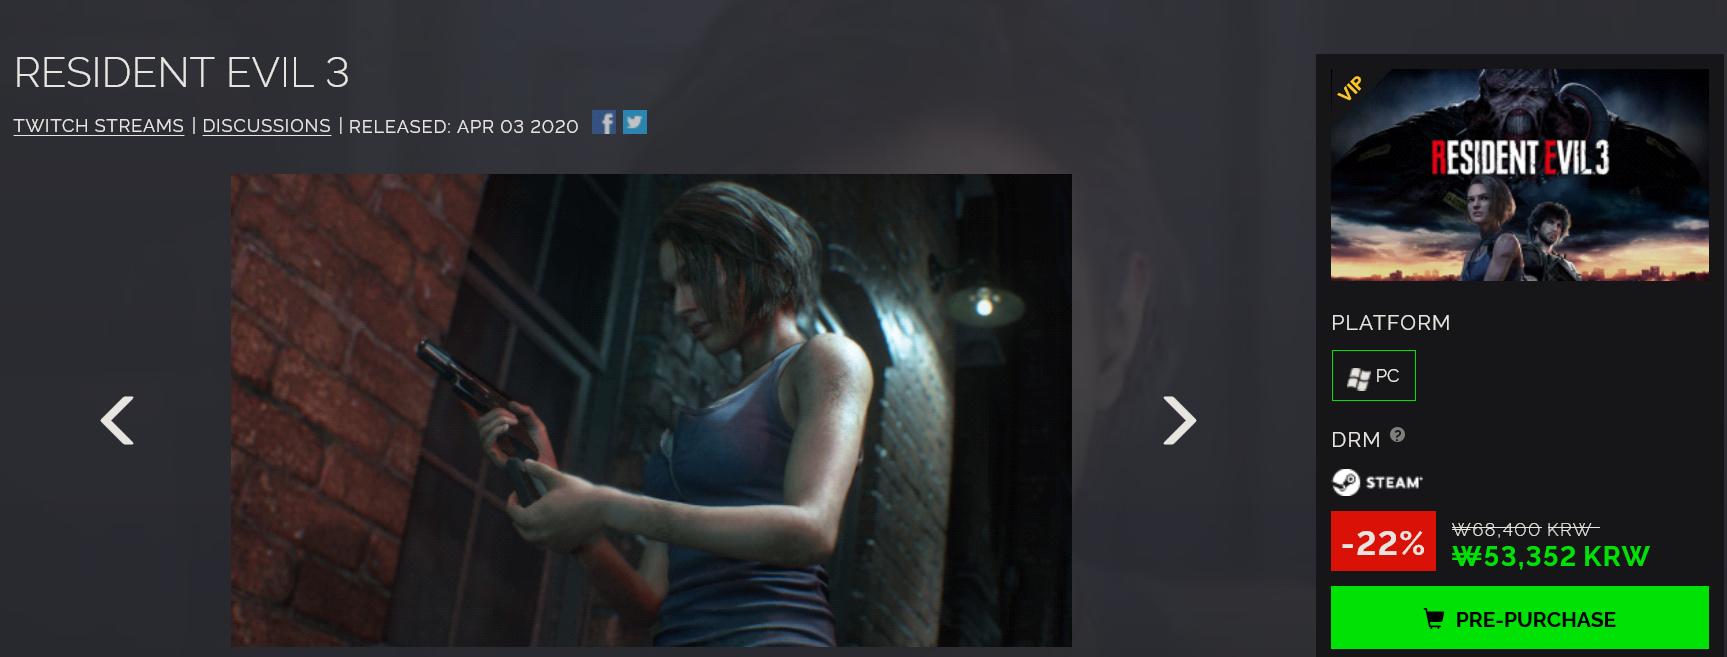 Screenshot_2020-01-14 RESIDENT EVIL 3 PC - Steam Game Keys.png